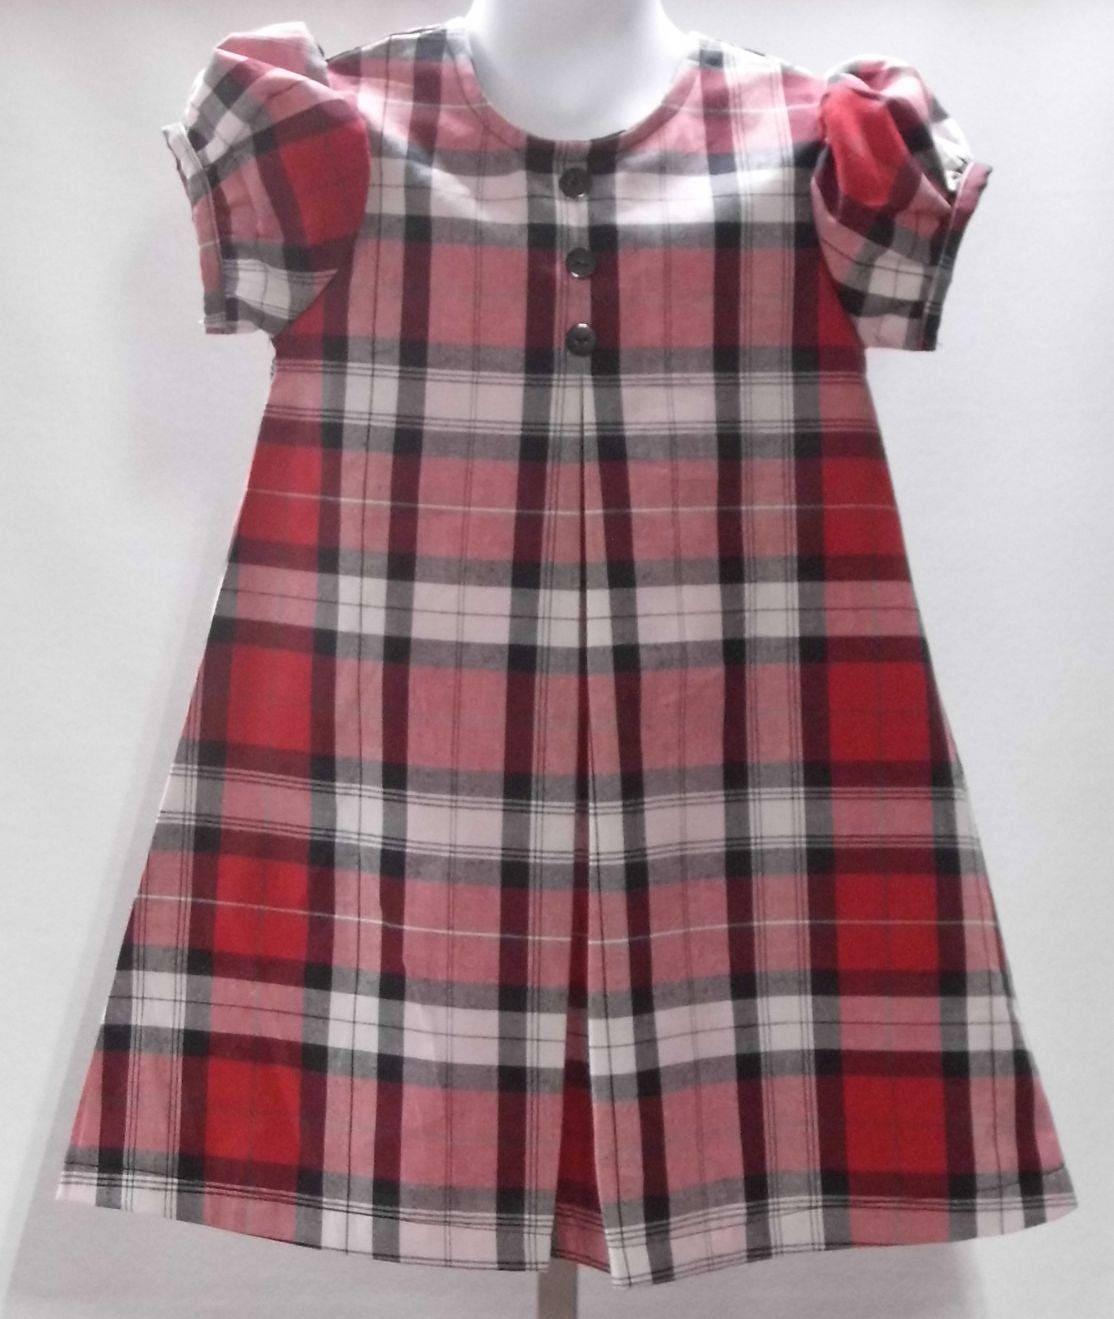 19e3ba74d Little girl dress Christmas dress holiday dressplaid dress | Etsy